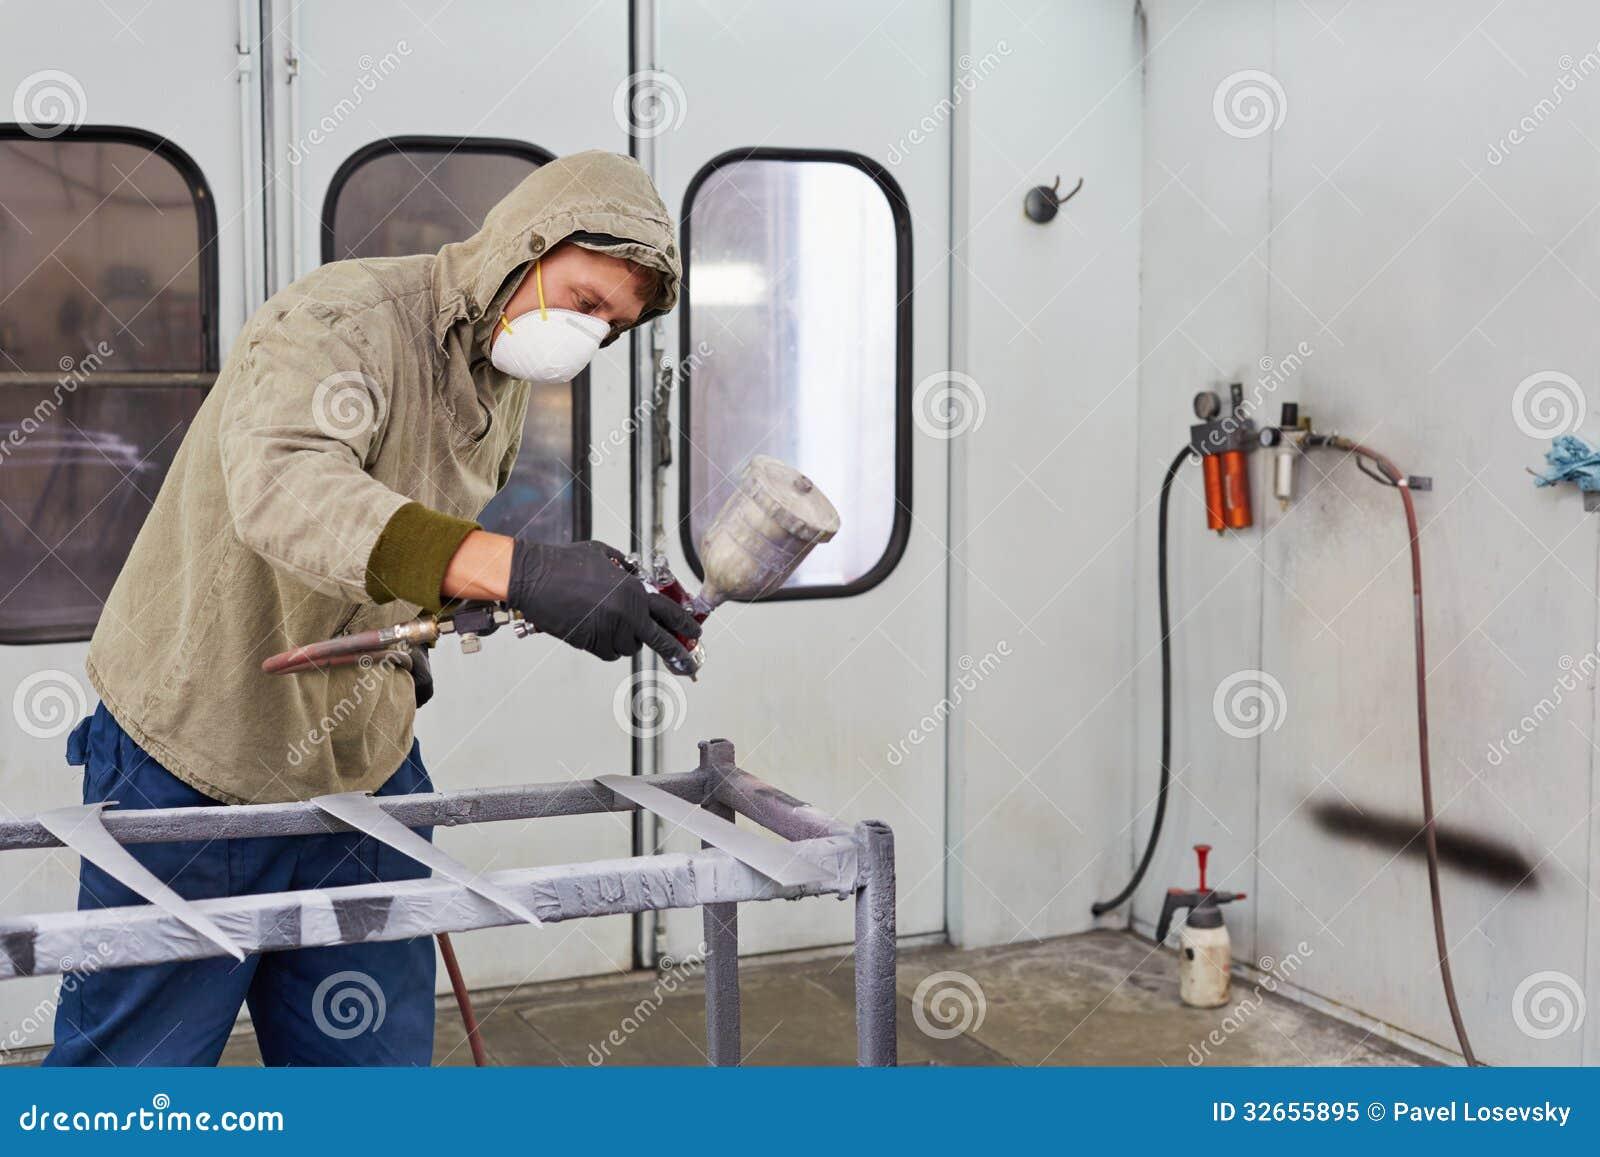 Man in protective clothes paints car details